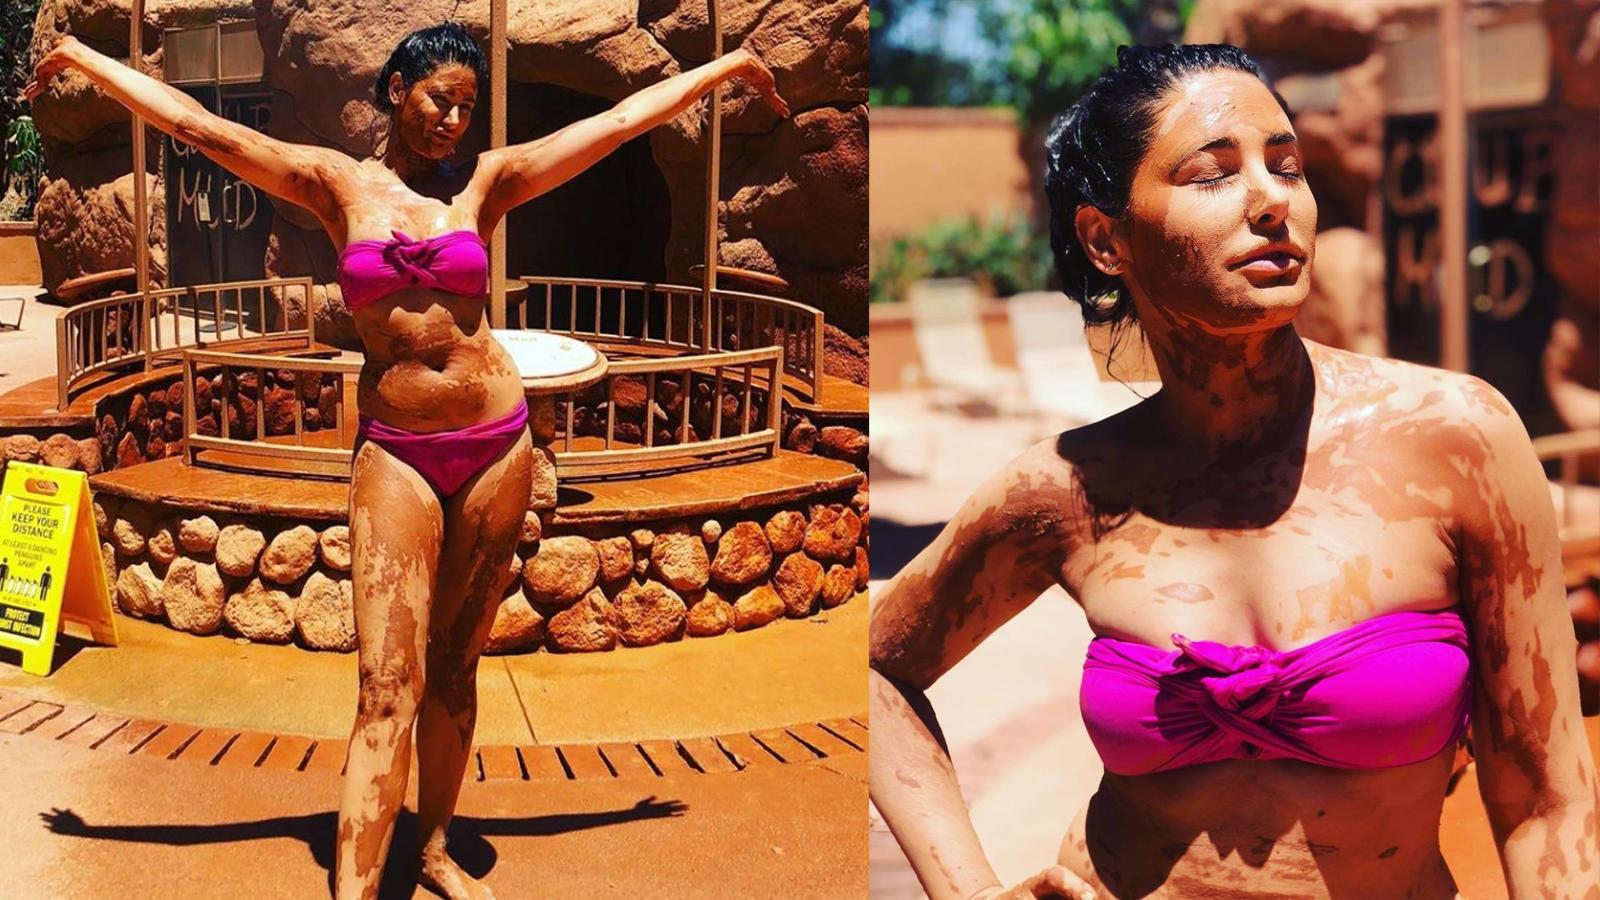 nargis-fakhri-looks-bewitching-in-a-stylish-bikini-as-she-enjoys-mud-bath-in-california